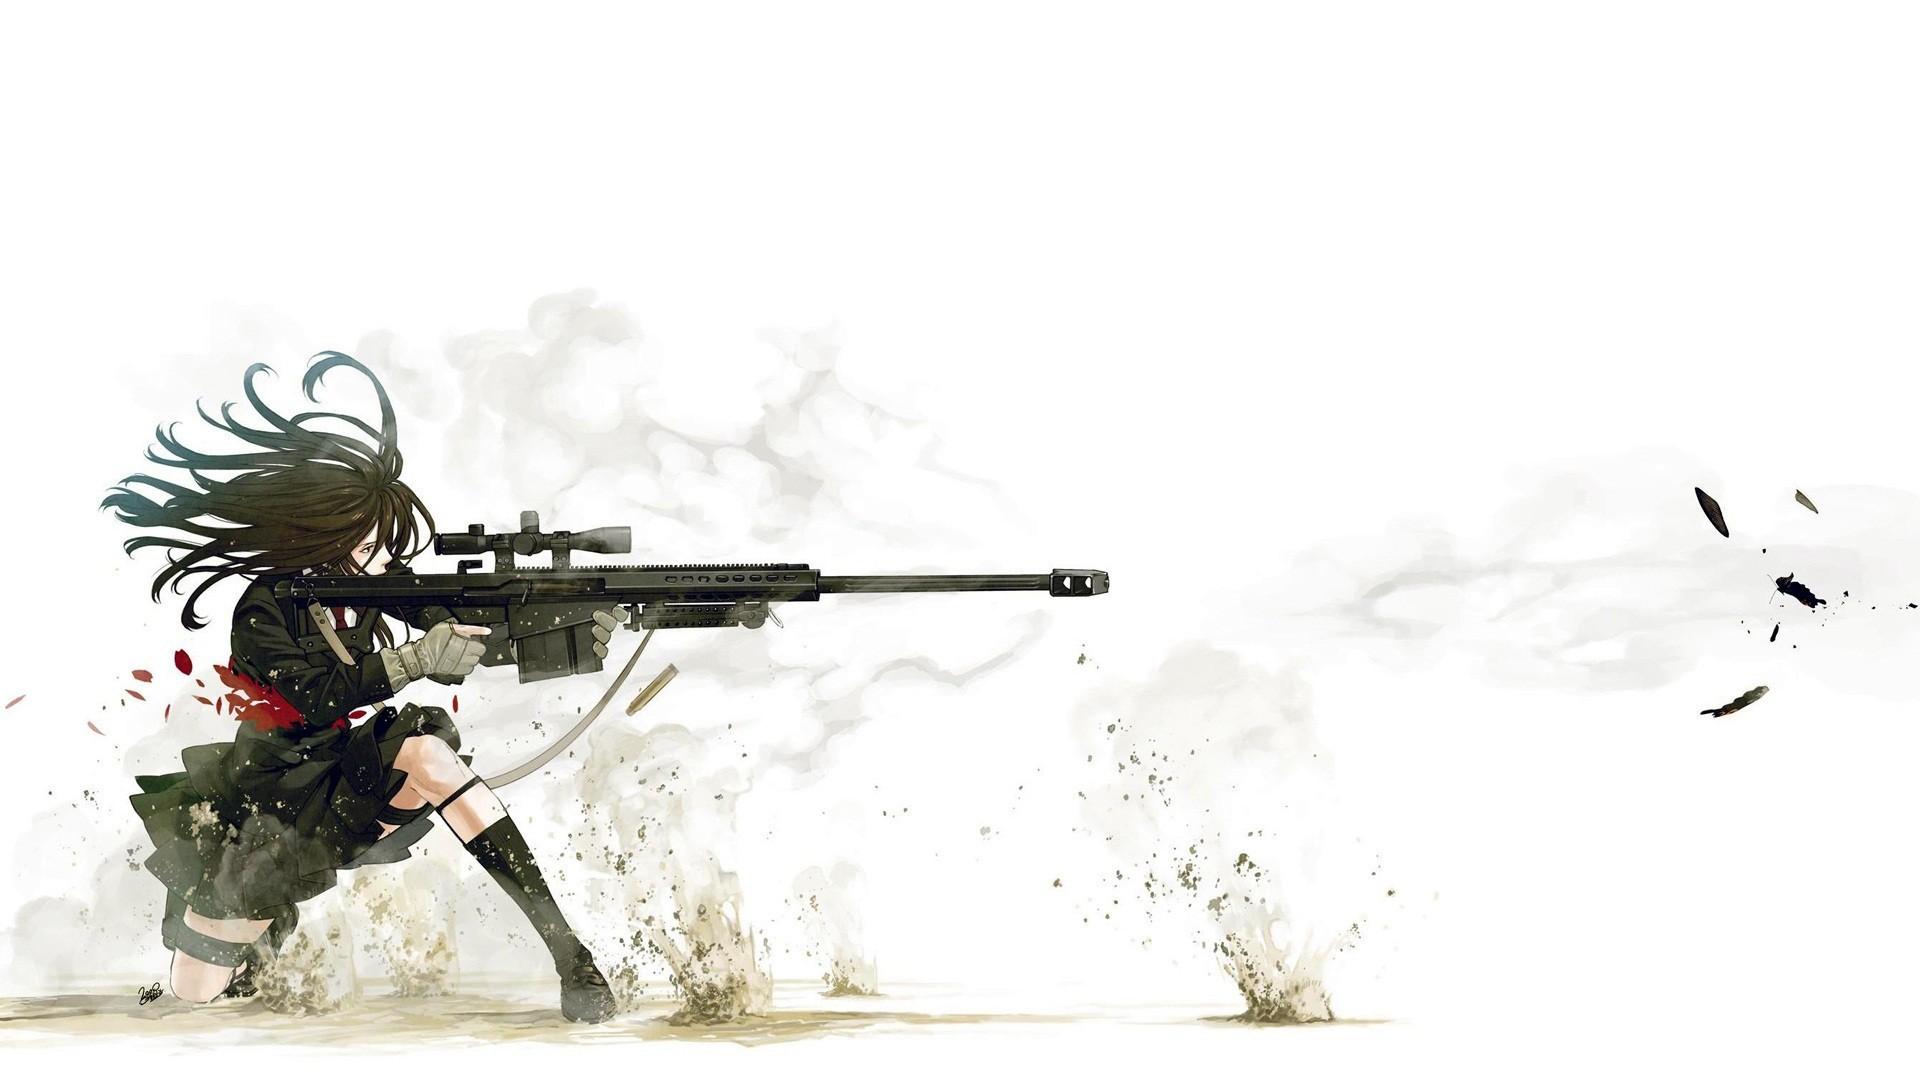 … x 1080 Original. Description: Download Anime Sniper Anime wallpaper …